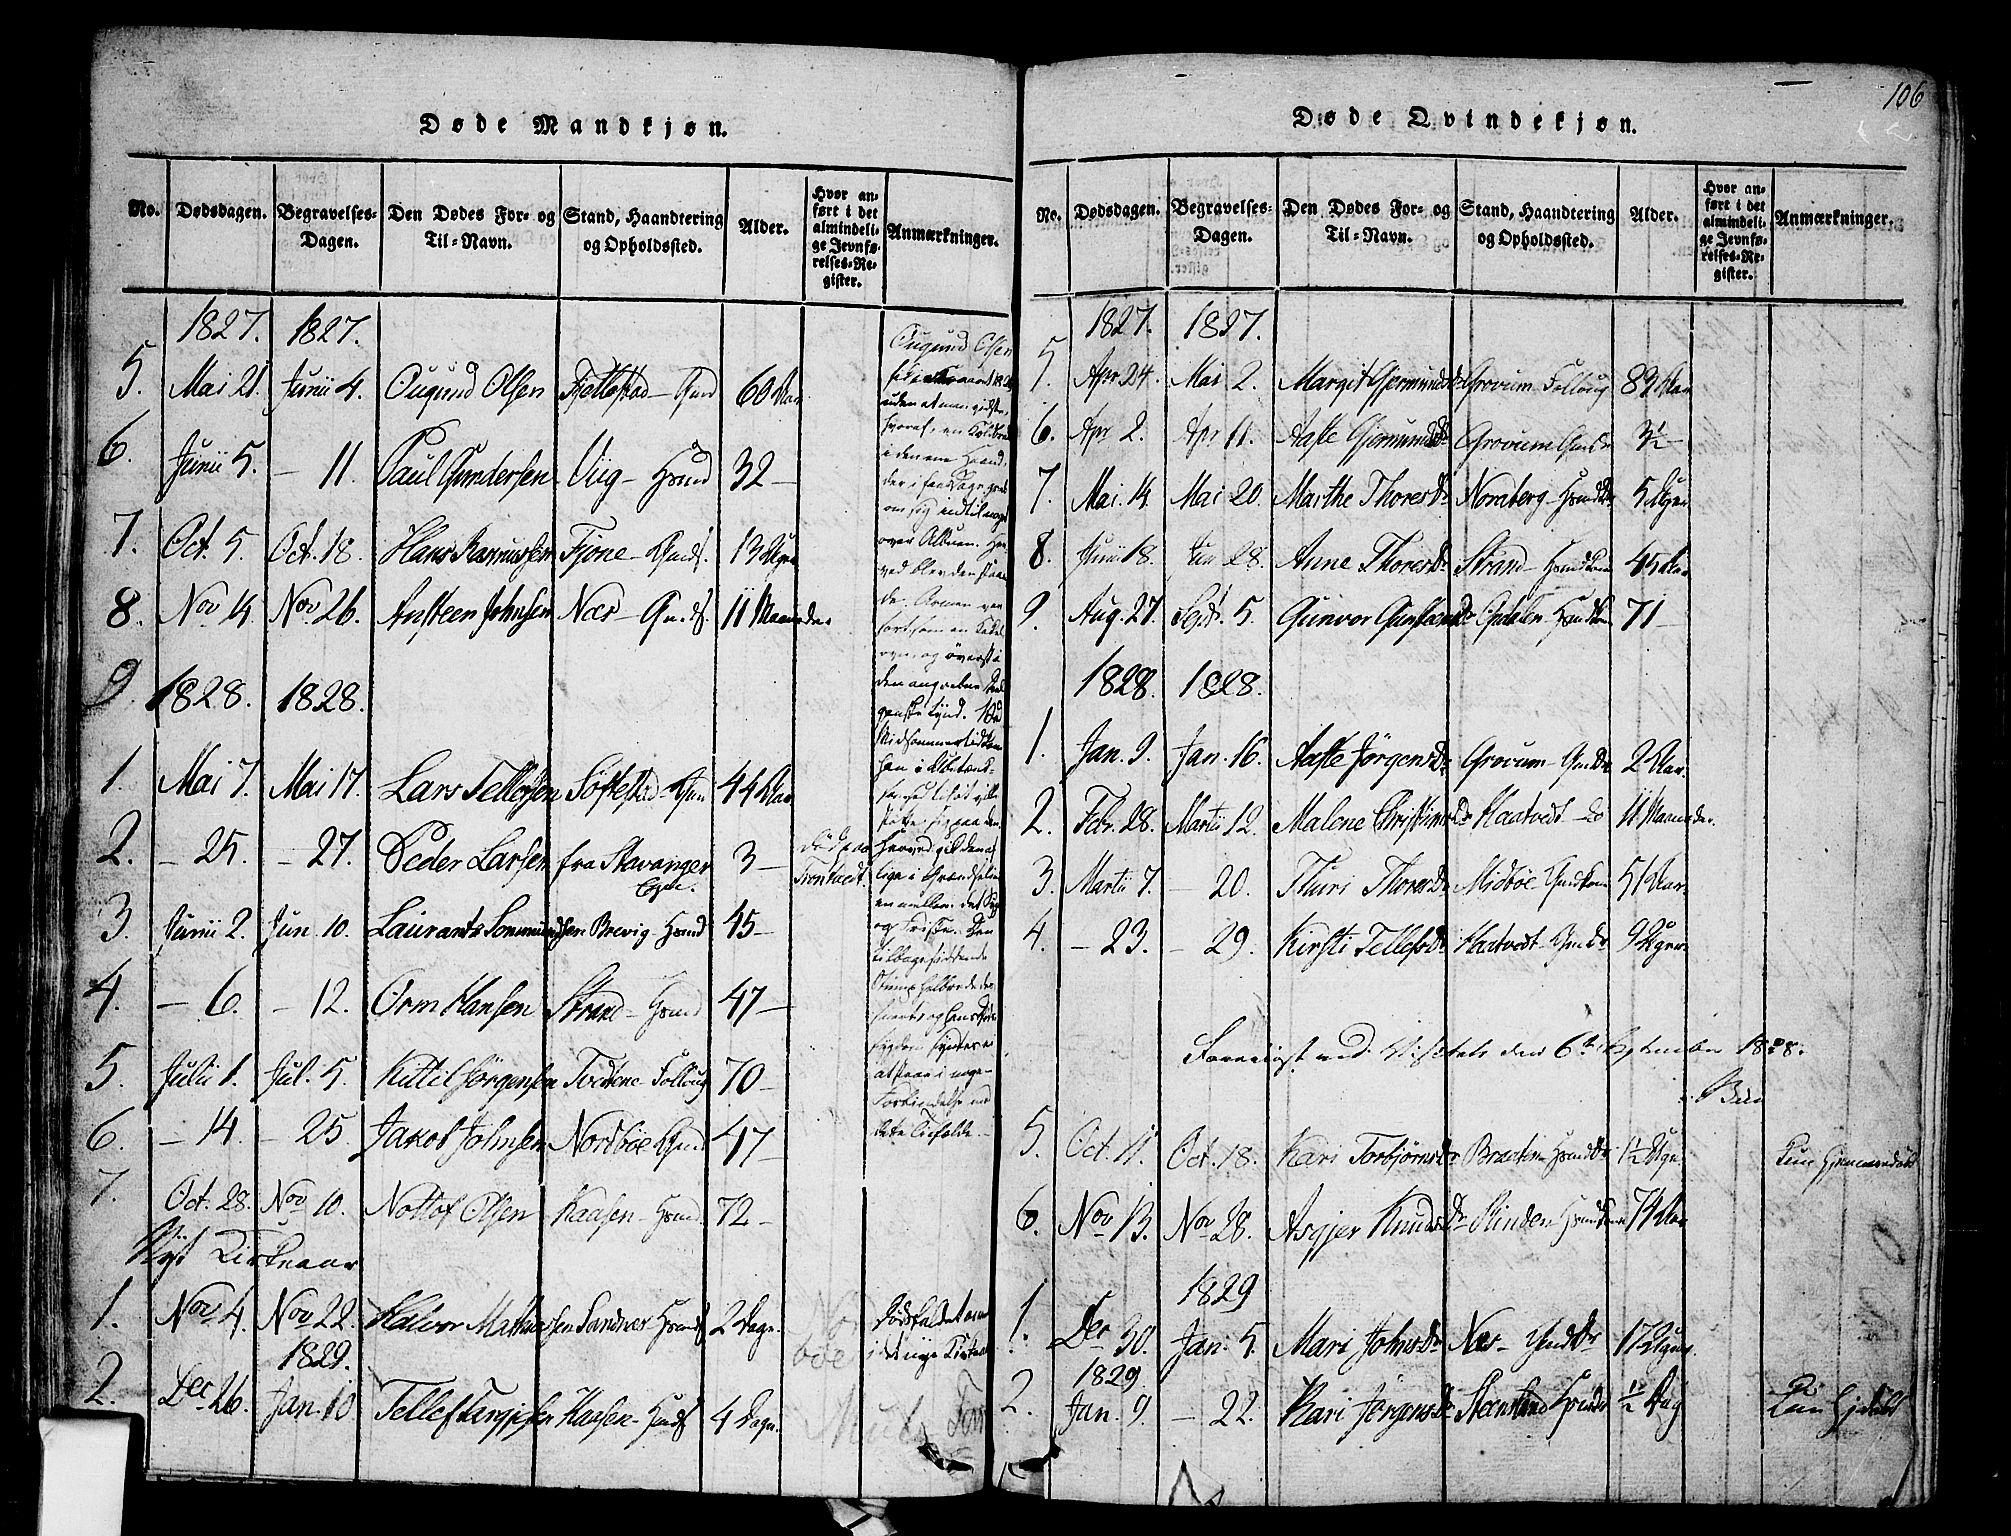 SAKO, Nissedal kirkebøker, F/Fa/L0002: Ministerialbok nr. I 2, 1814-1845, s. 106